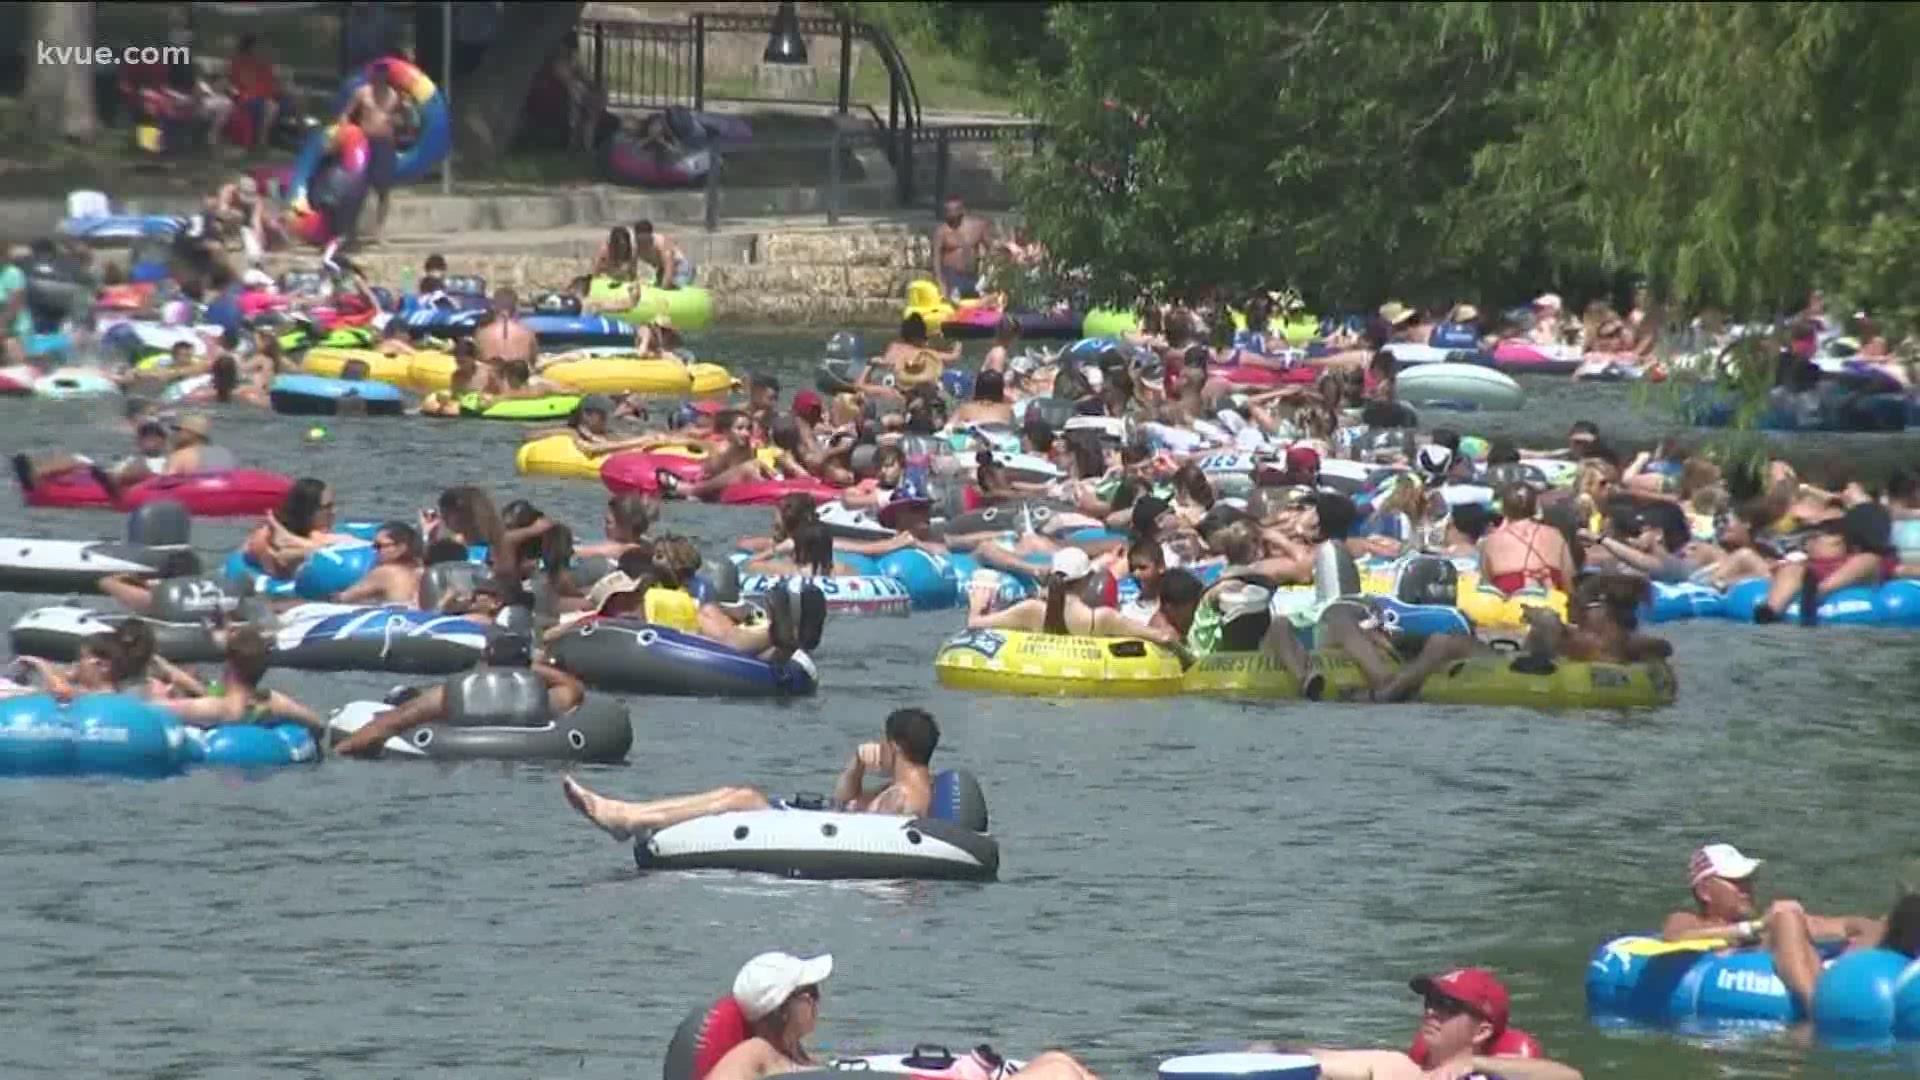 Coronavirus In Texas Tubing Rafting Must Close Under New Order Kvue Com